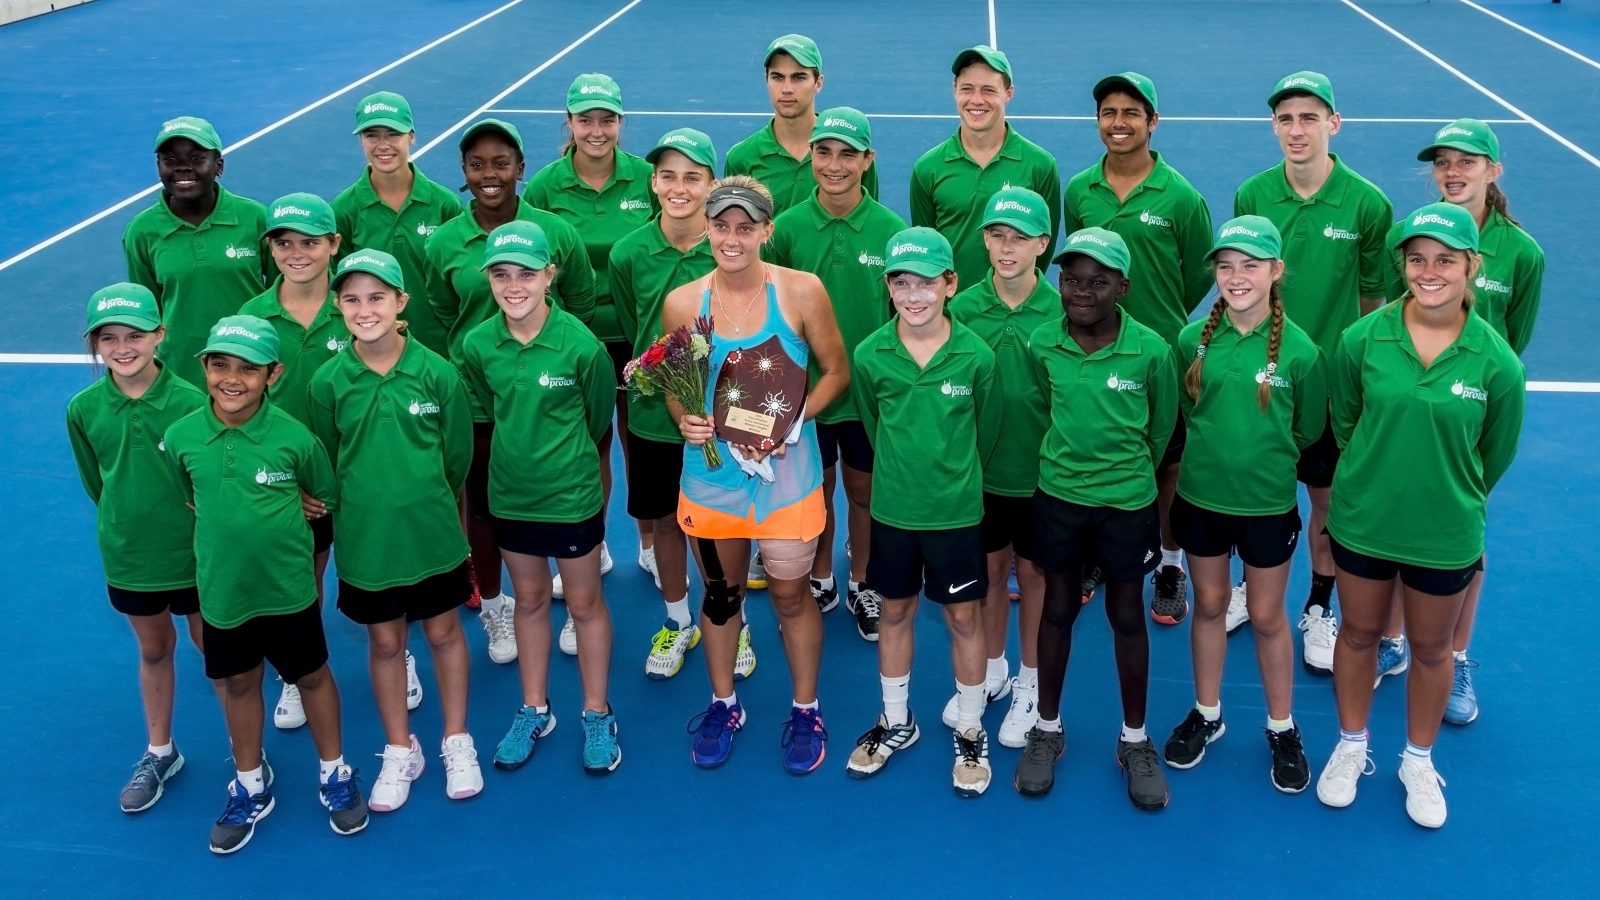 Finals Day Playford Tennis Centre